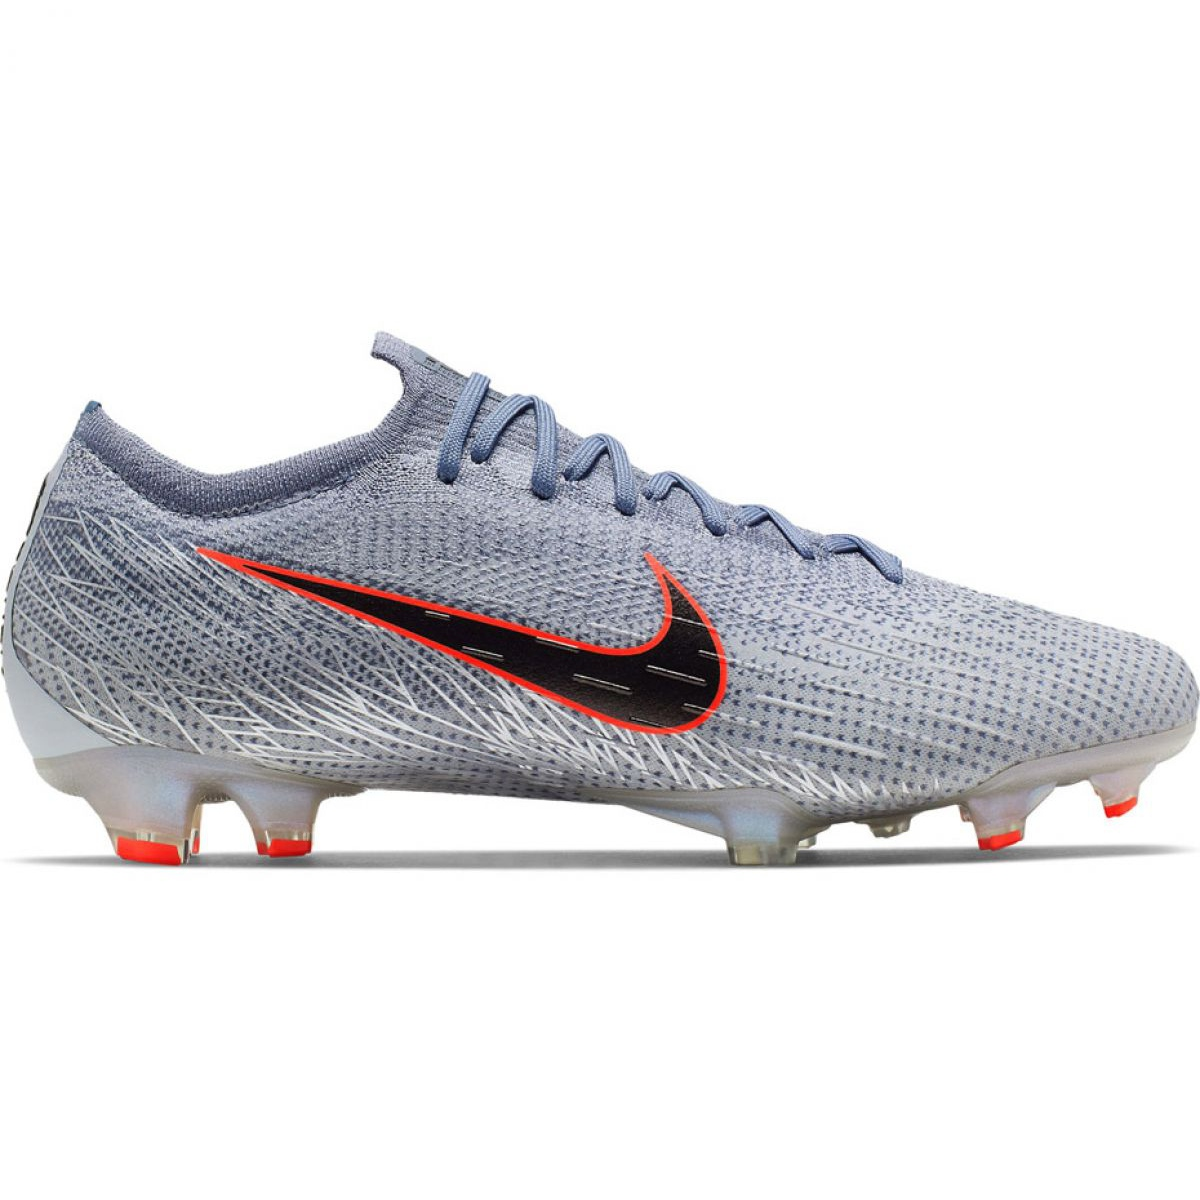 Uomo | Scarpe Nike VAPOR 12 ELITE FG Scarpe da calcetto